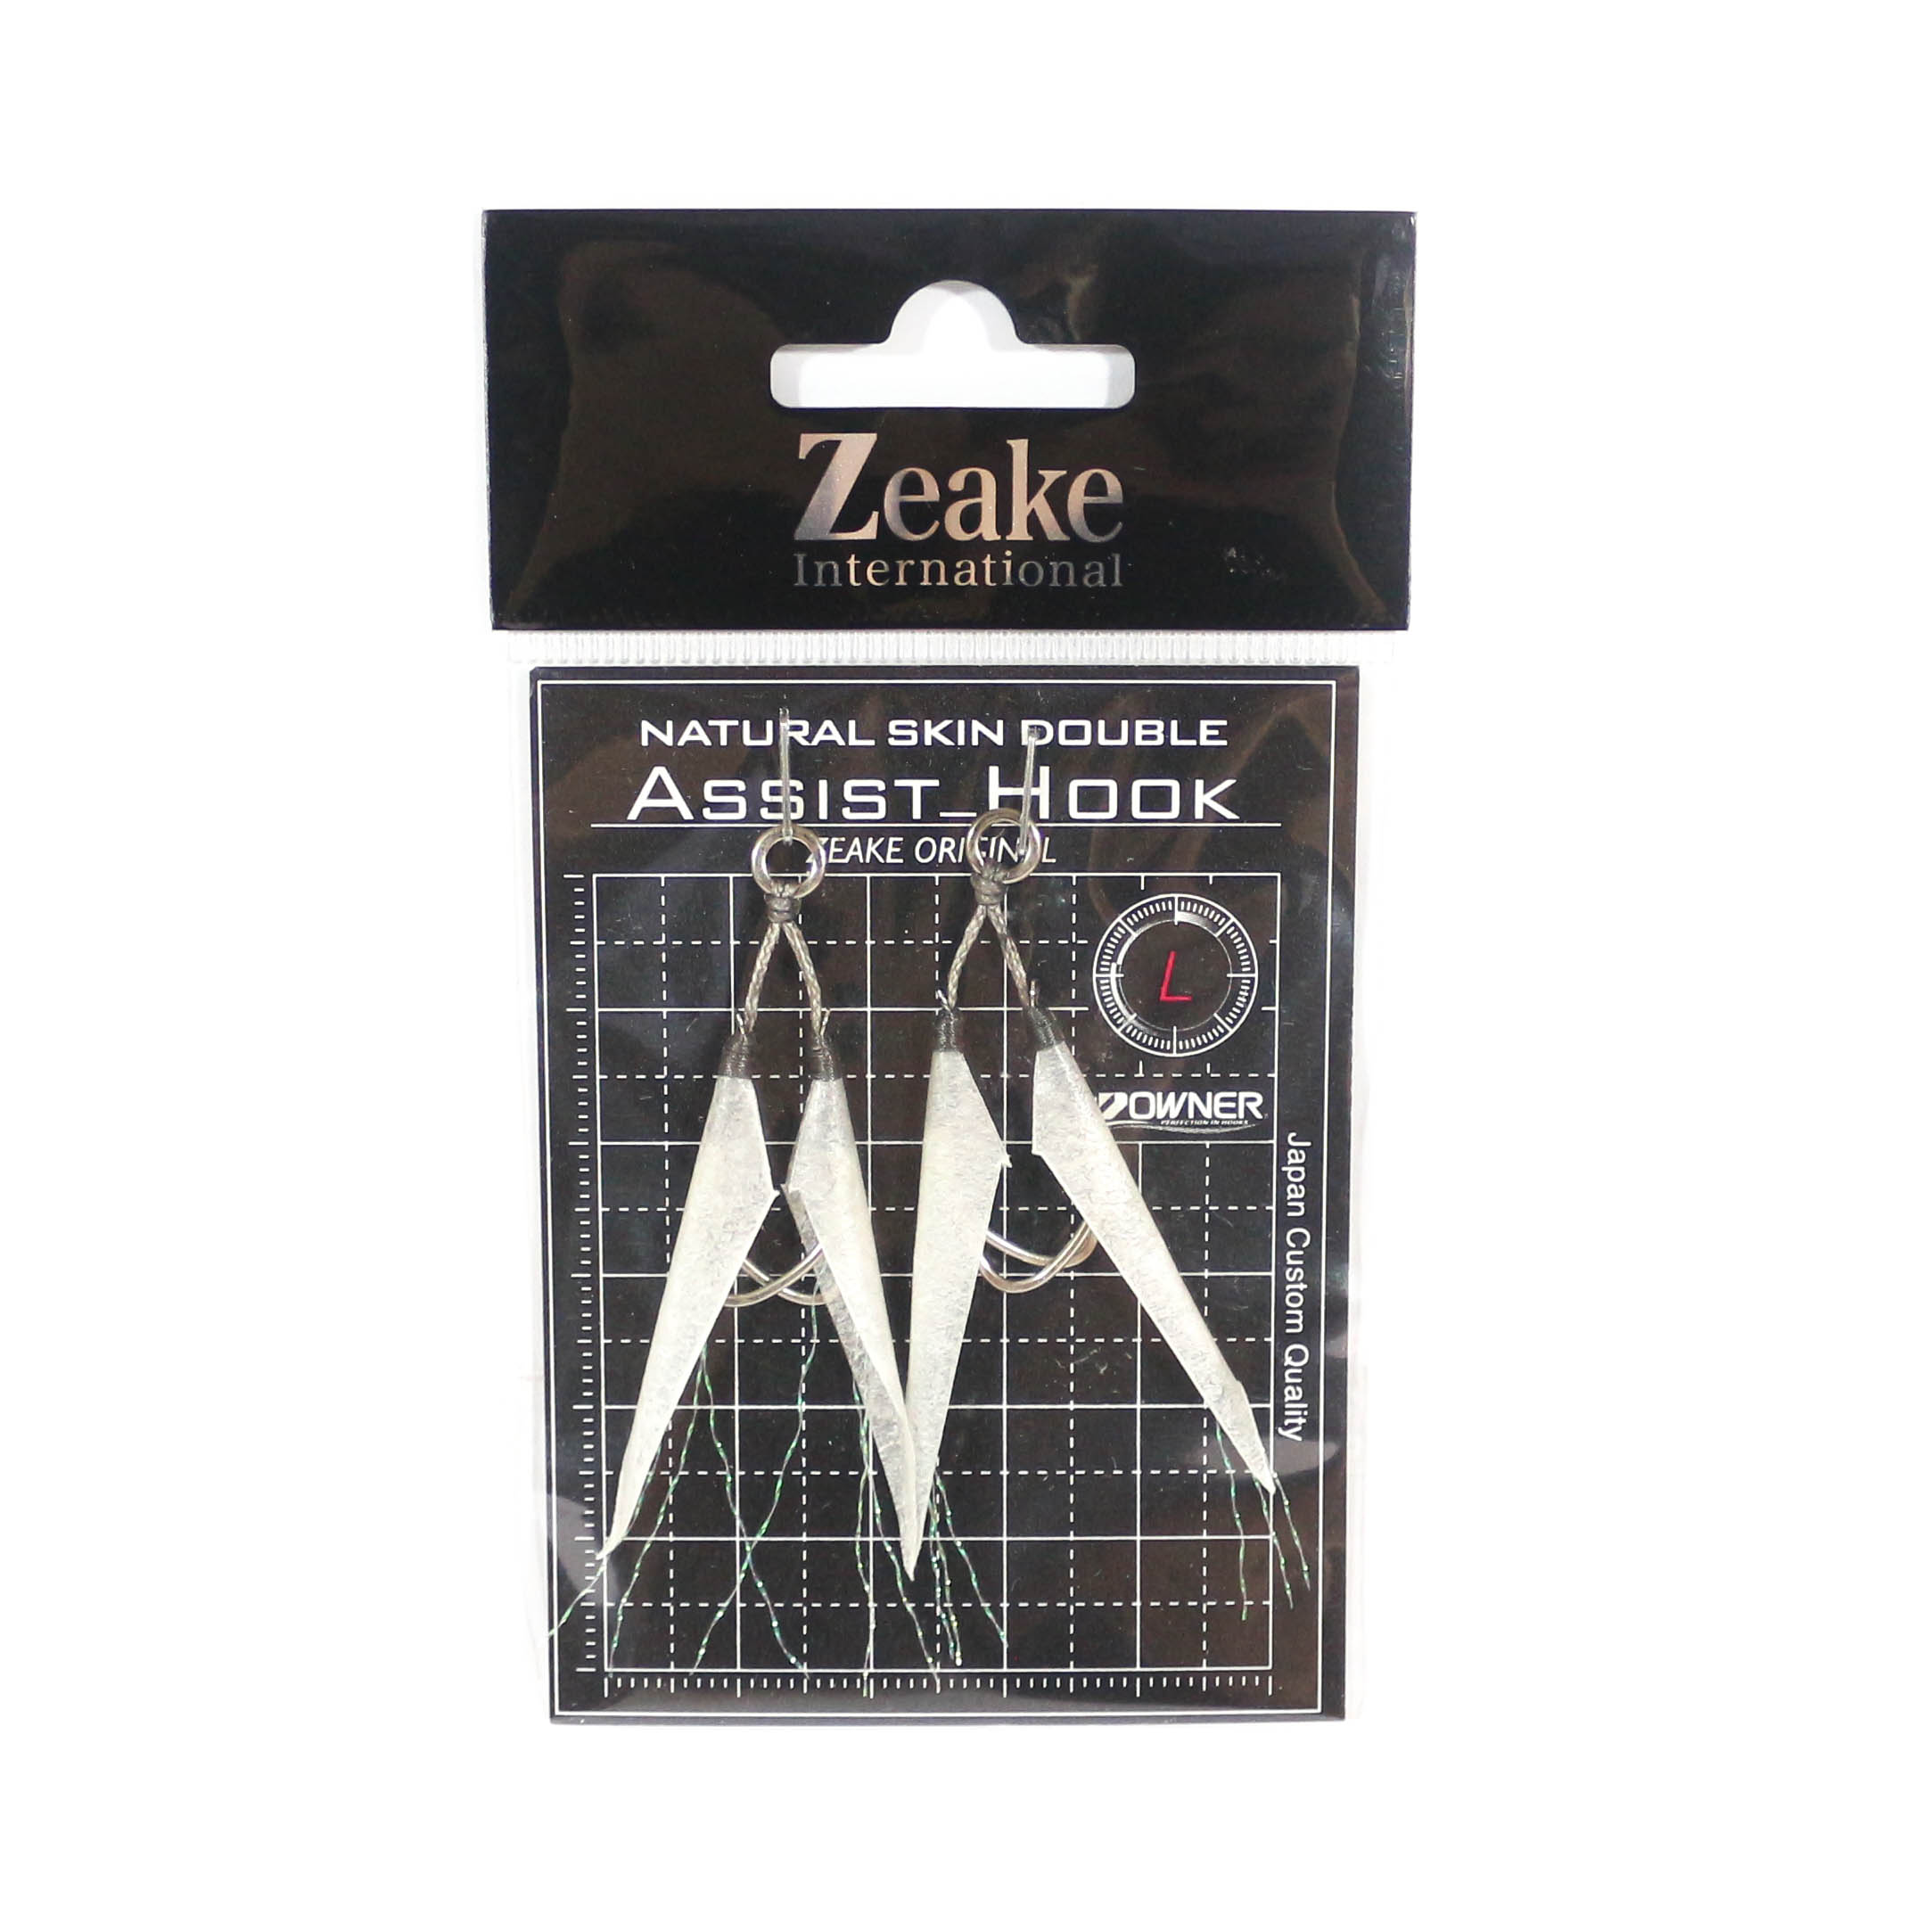 Zeake Assist Hook Double Fish Skin SLJ 2 per pack L (Size 3) (3070)